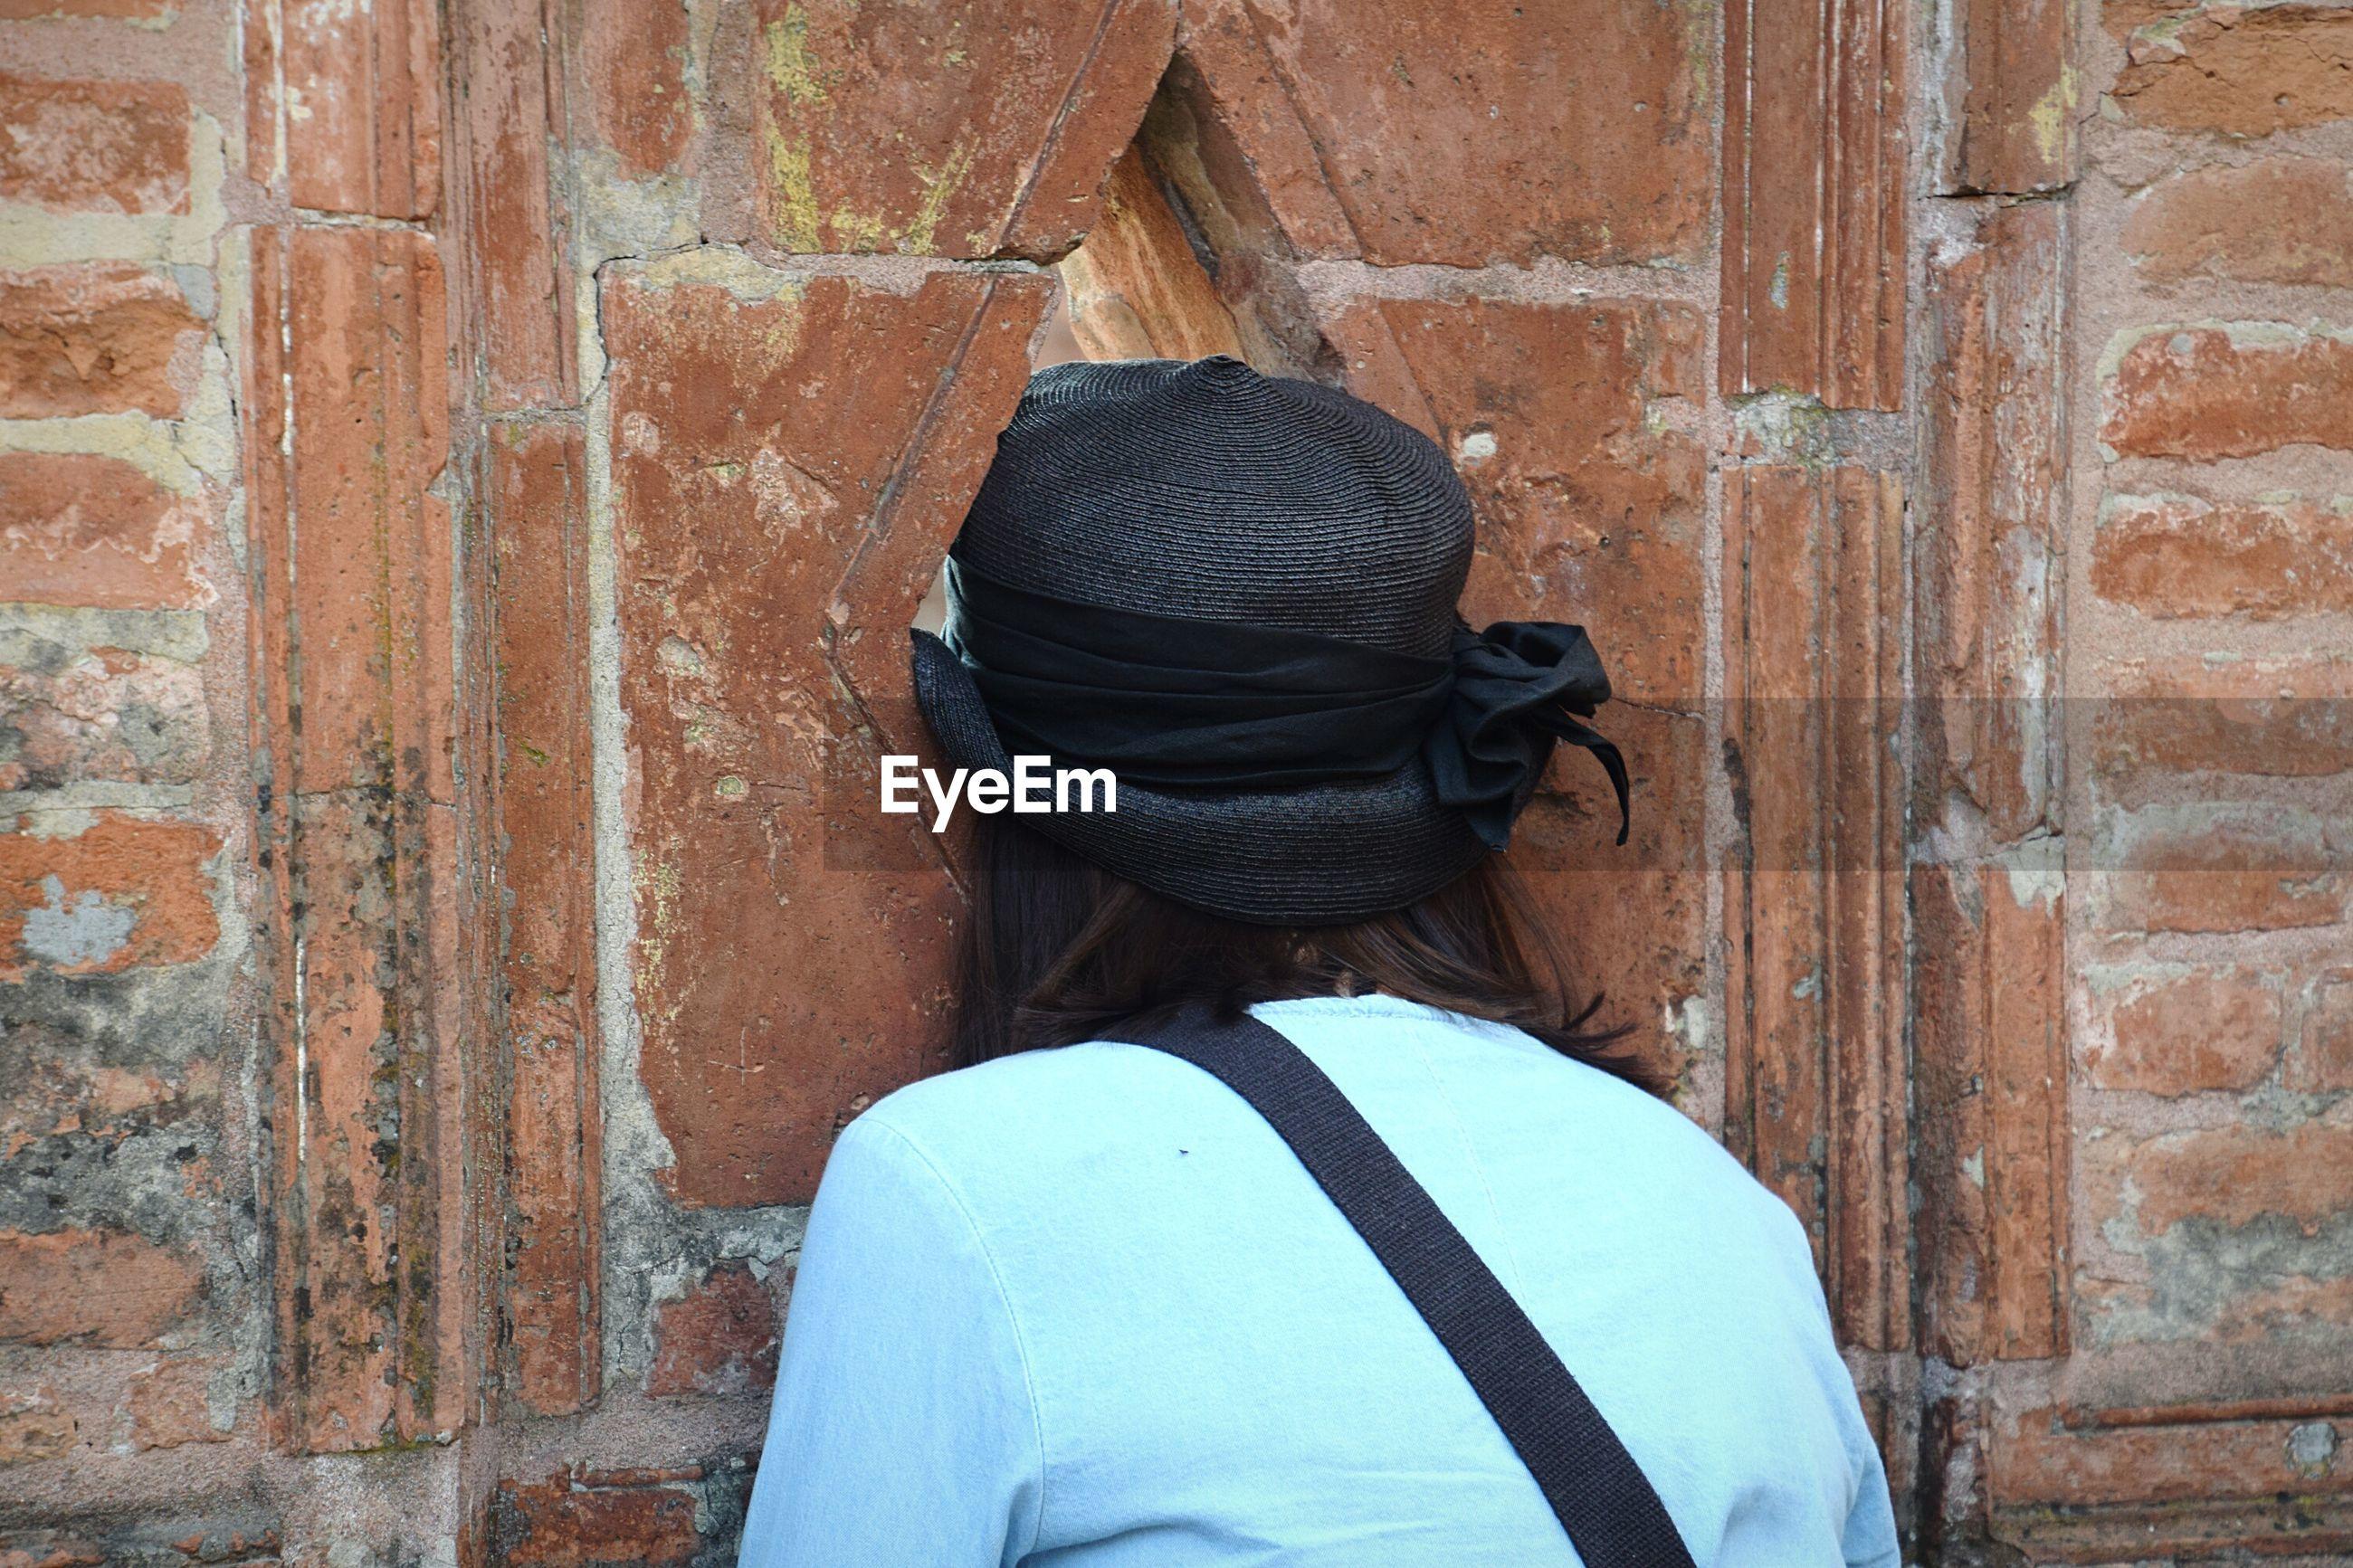 Rear view of woman peeking through hole in wall